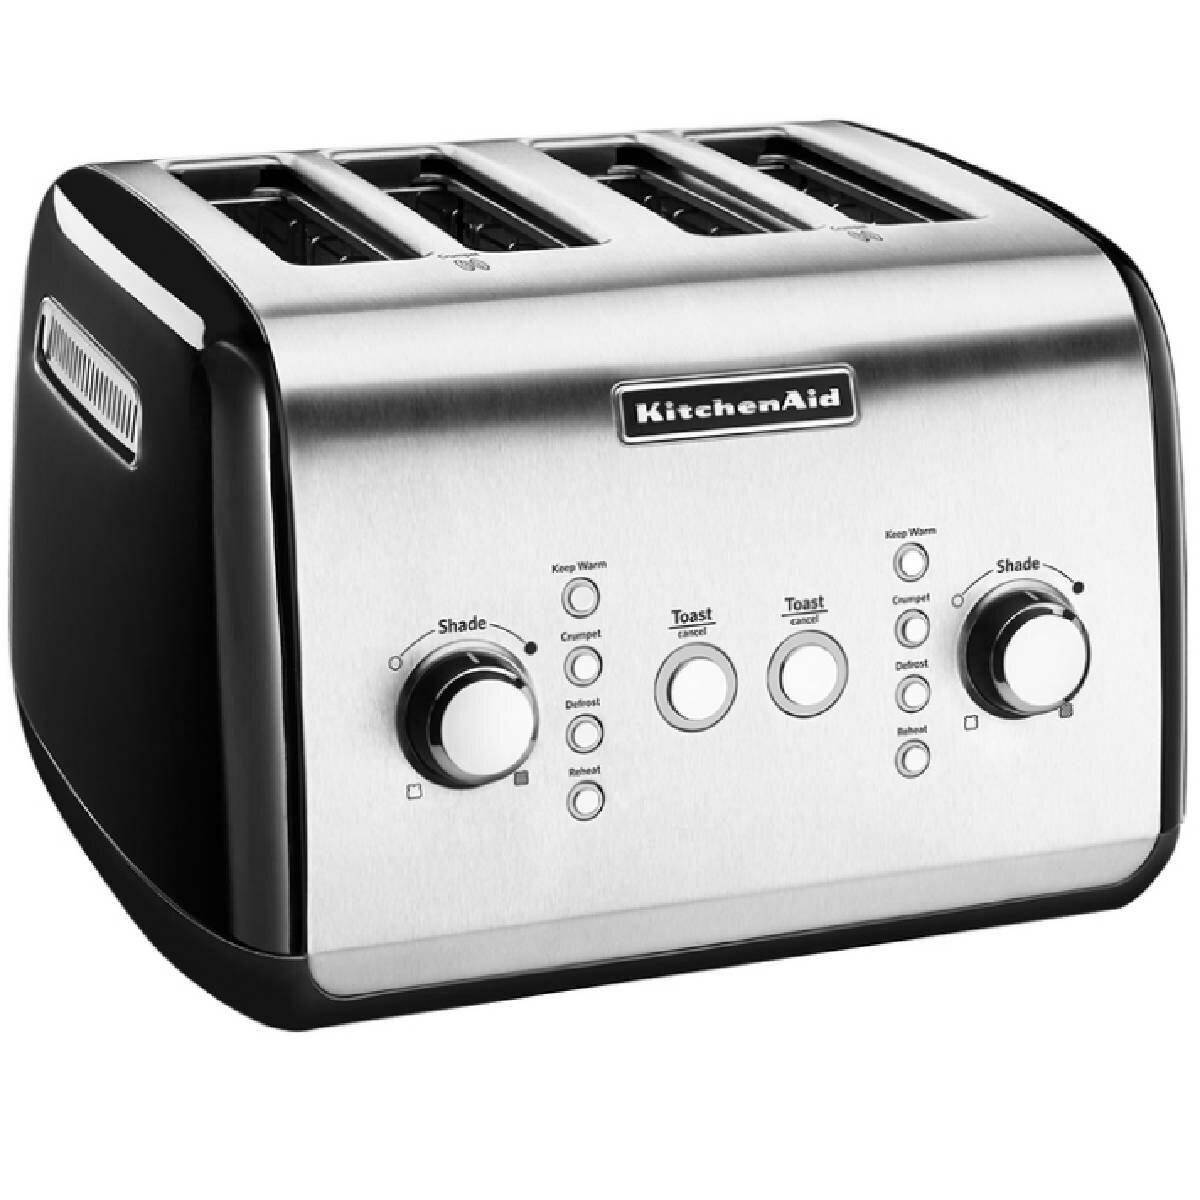 Kitchenaid Classic Automatic 4 Slice Toaster 5kmt421aob Appliances Online